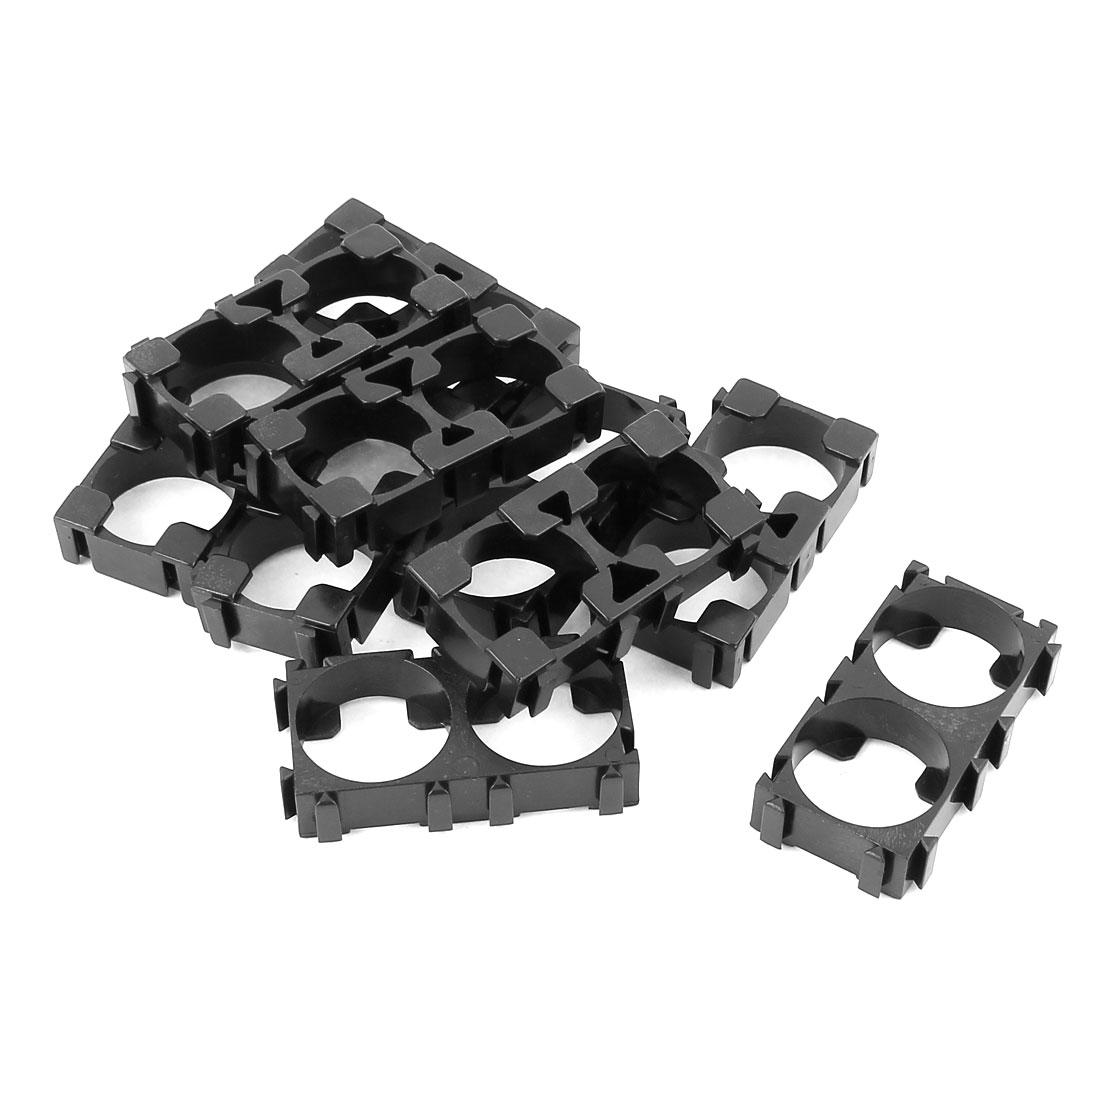 10 Pcs 18650 Lithium Cell Battery Double Holder Bracket for DIY Battery Pack